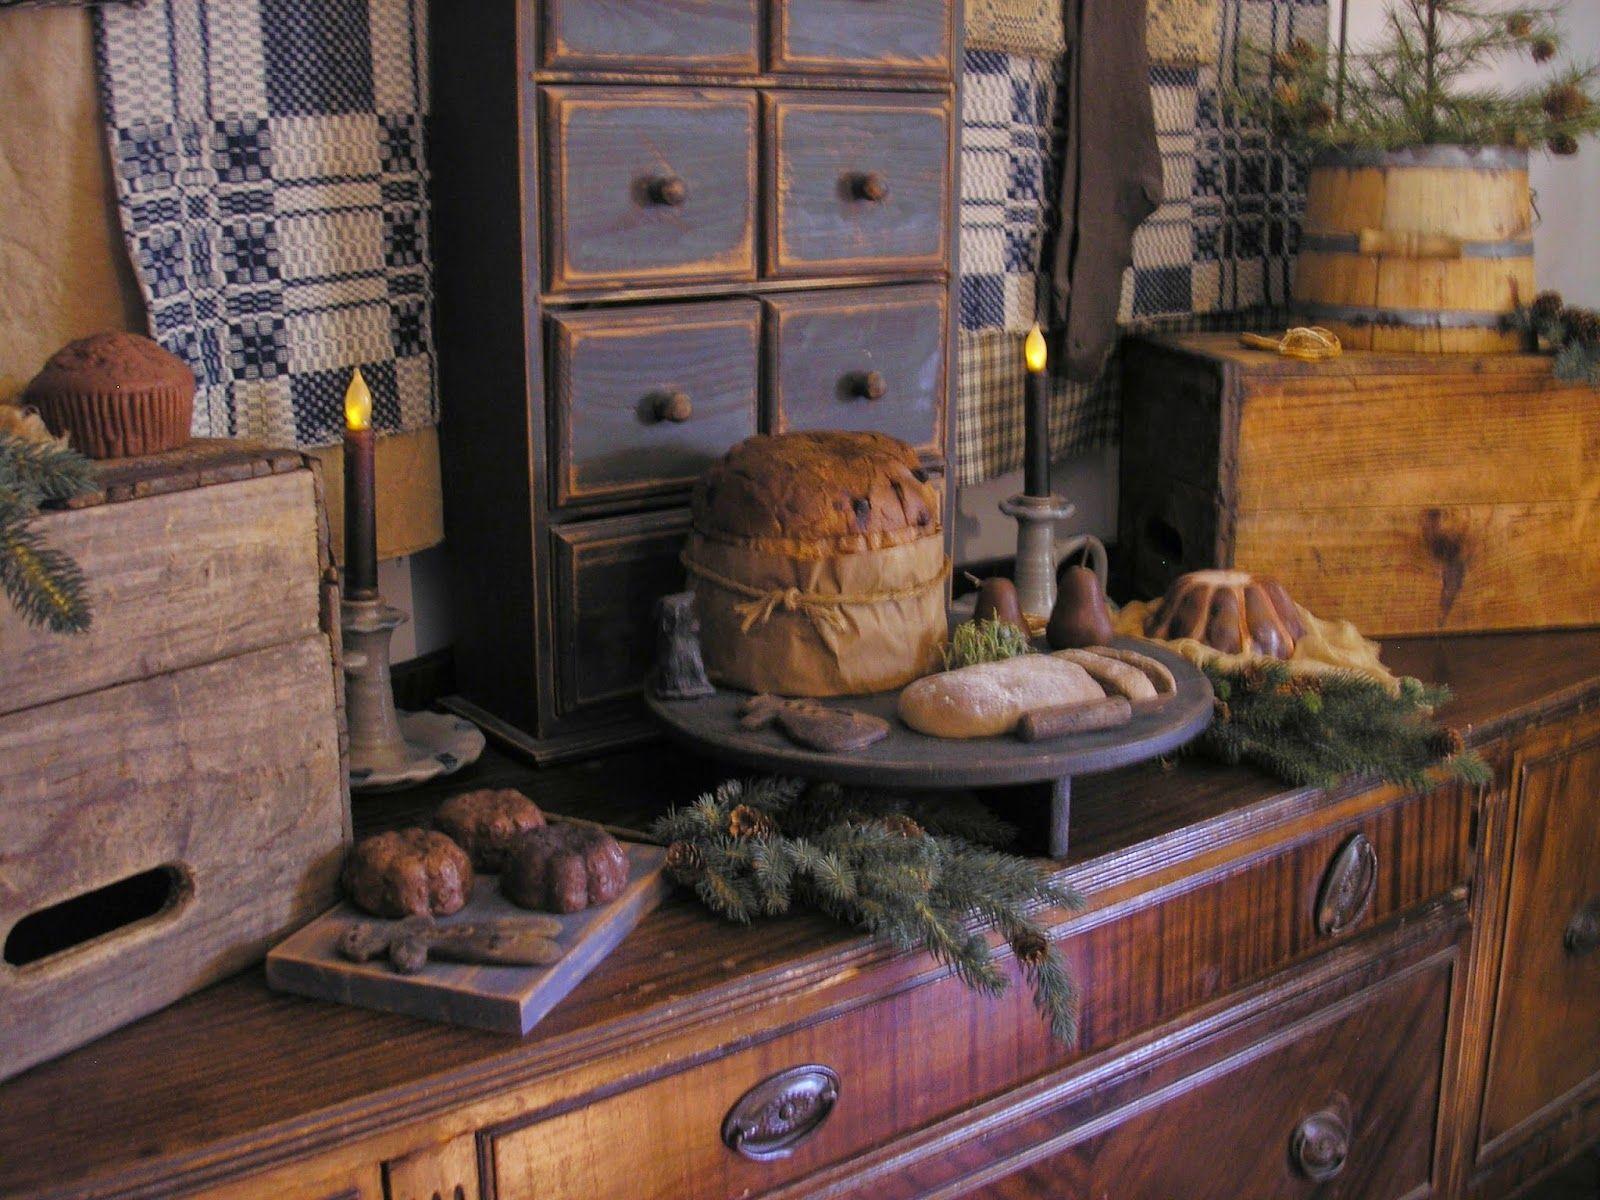 taylors farmhouse attic merry christmas primitive christmas primitive decorating on farmhouse kitchen xmas id=18040